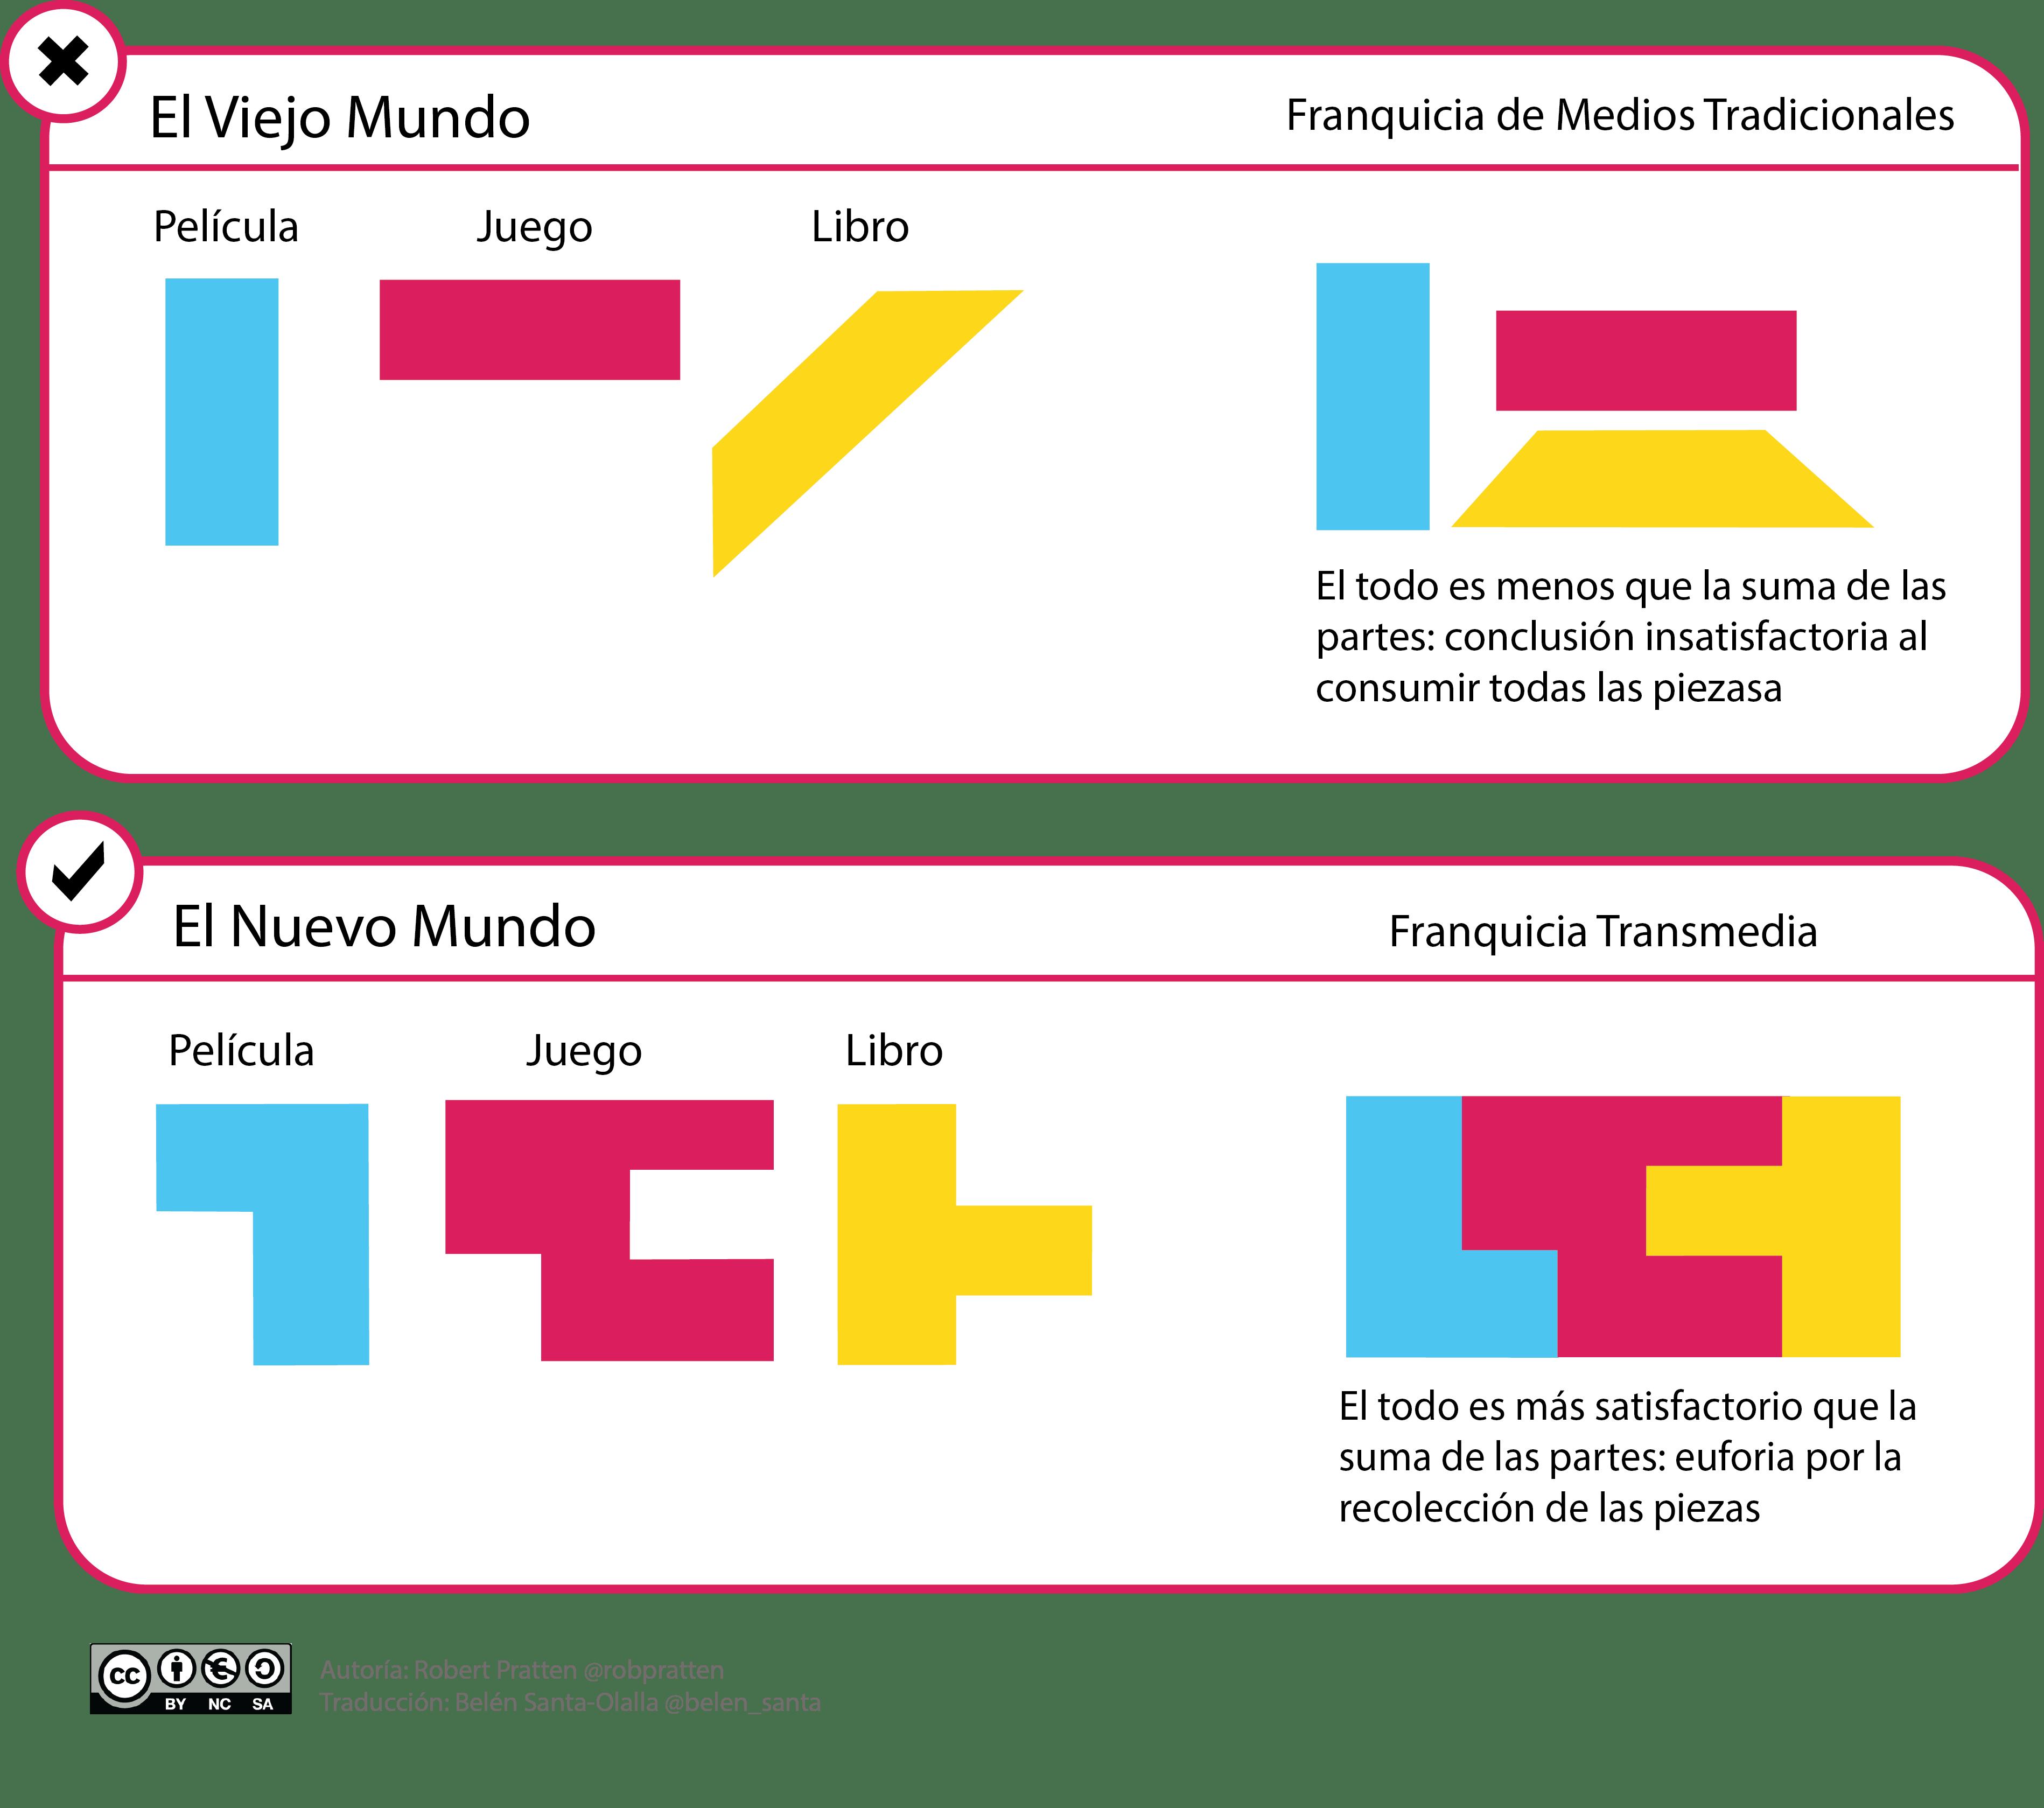 Transmedia